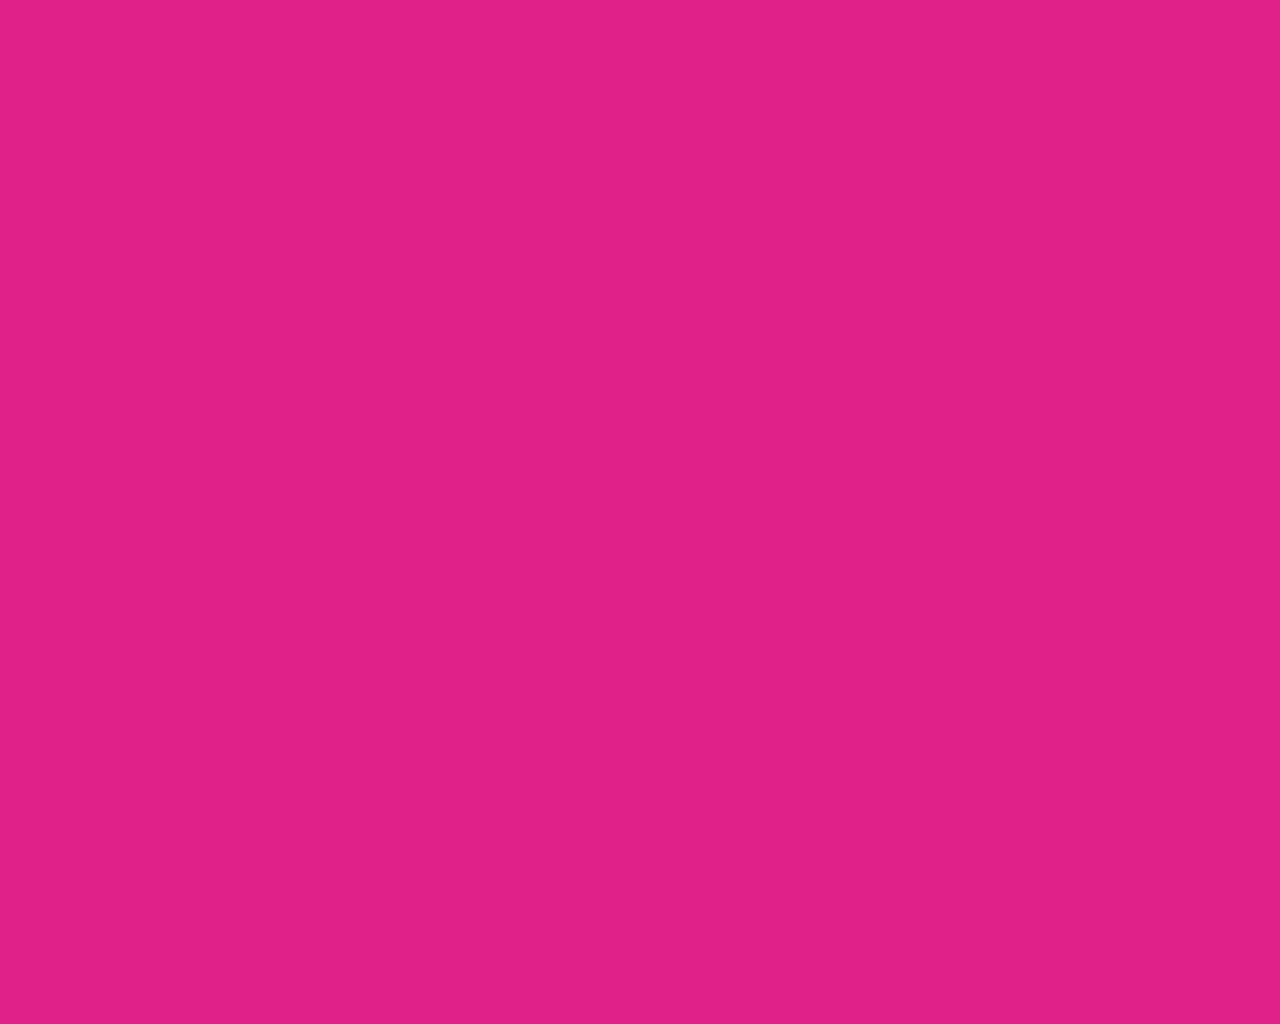 1280x1024 Barbie Pink Solid Color Background